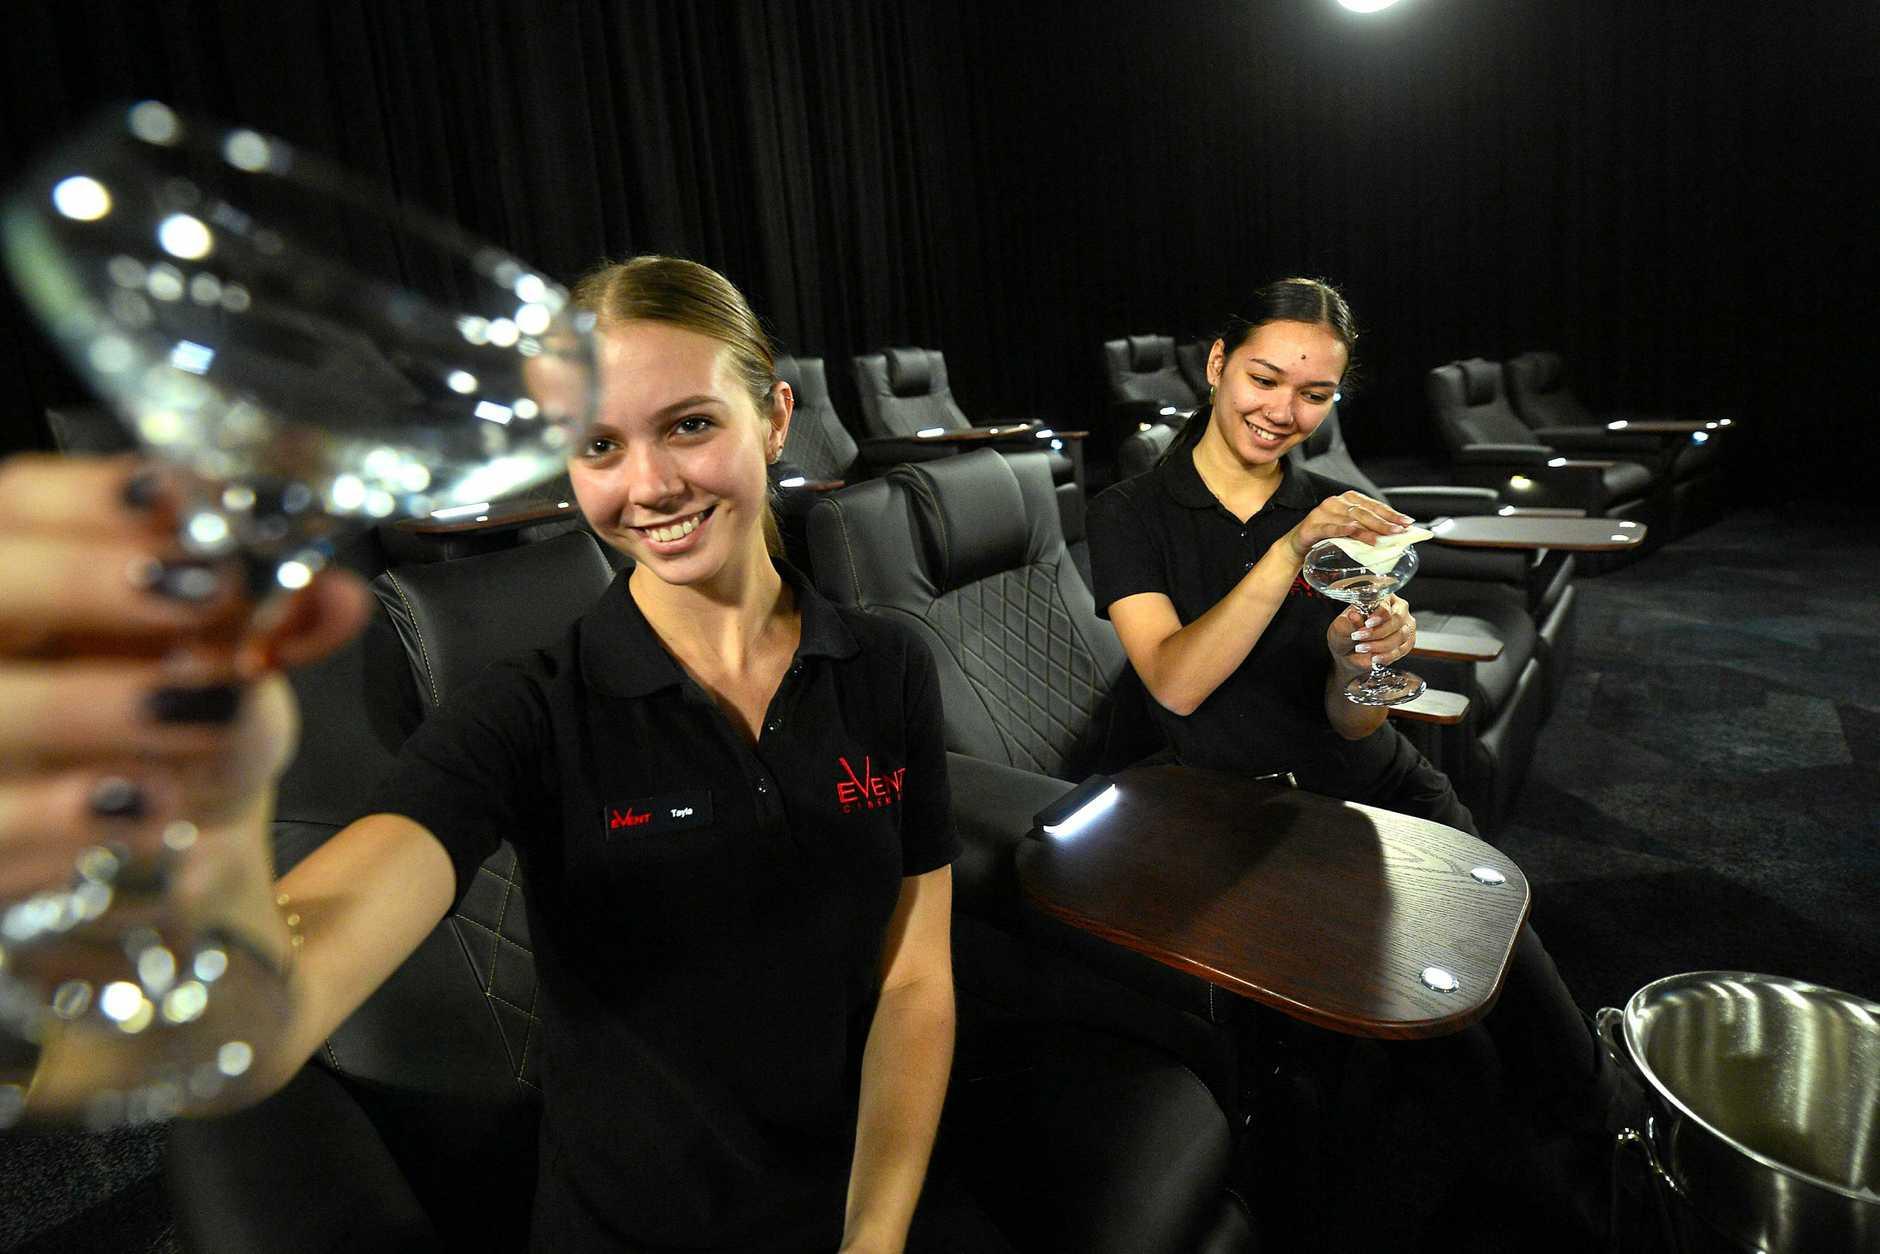 New cinemas  at Kawana Shoppingworld will be open soon. Tayla Dangerfield, 20, Buderim and Justiss Adams, 19, Beerwah.